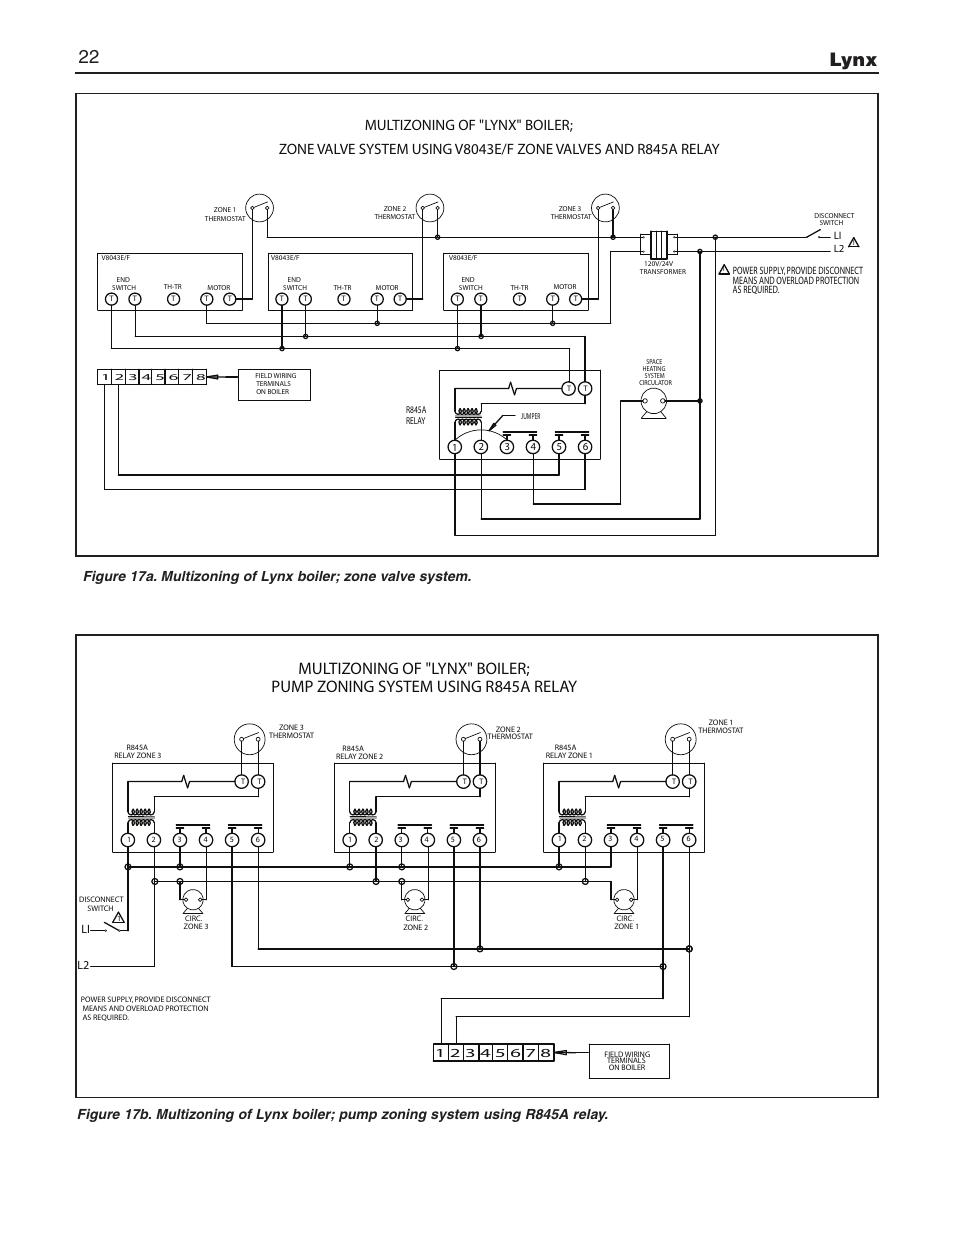 hight resolution of zone valve wiring diagram slant fin wiring library zone valve wiring schematic lynx 22 li